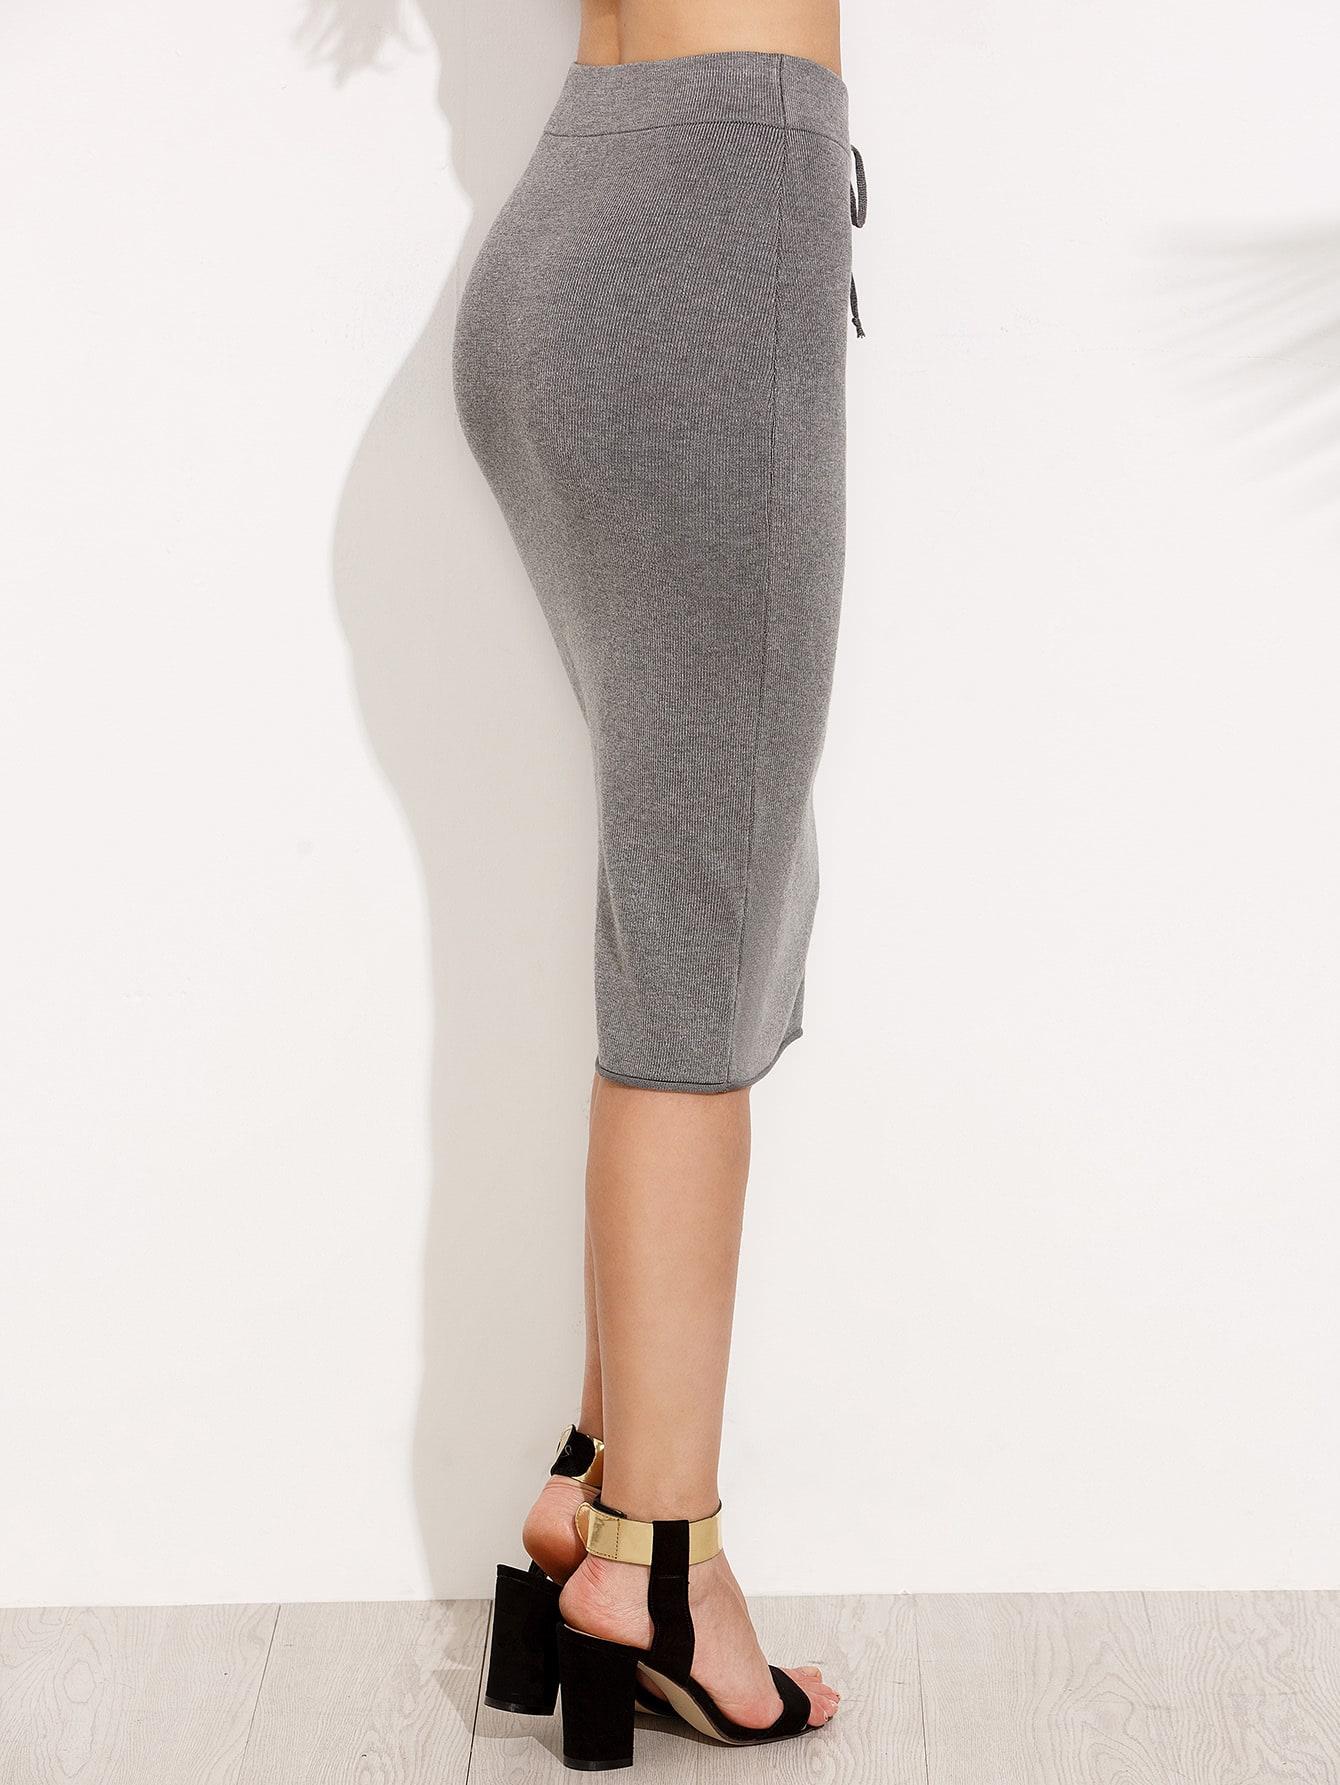 Grey Drawstring Knit Pencil Skirt -SheIn(Sheinside)